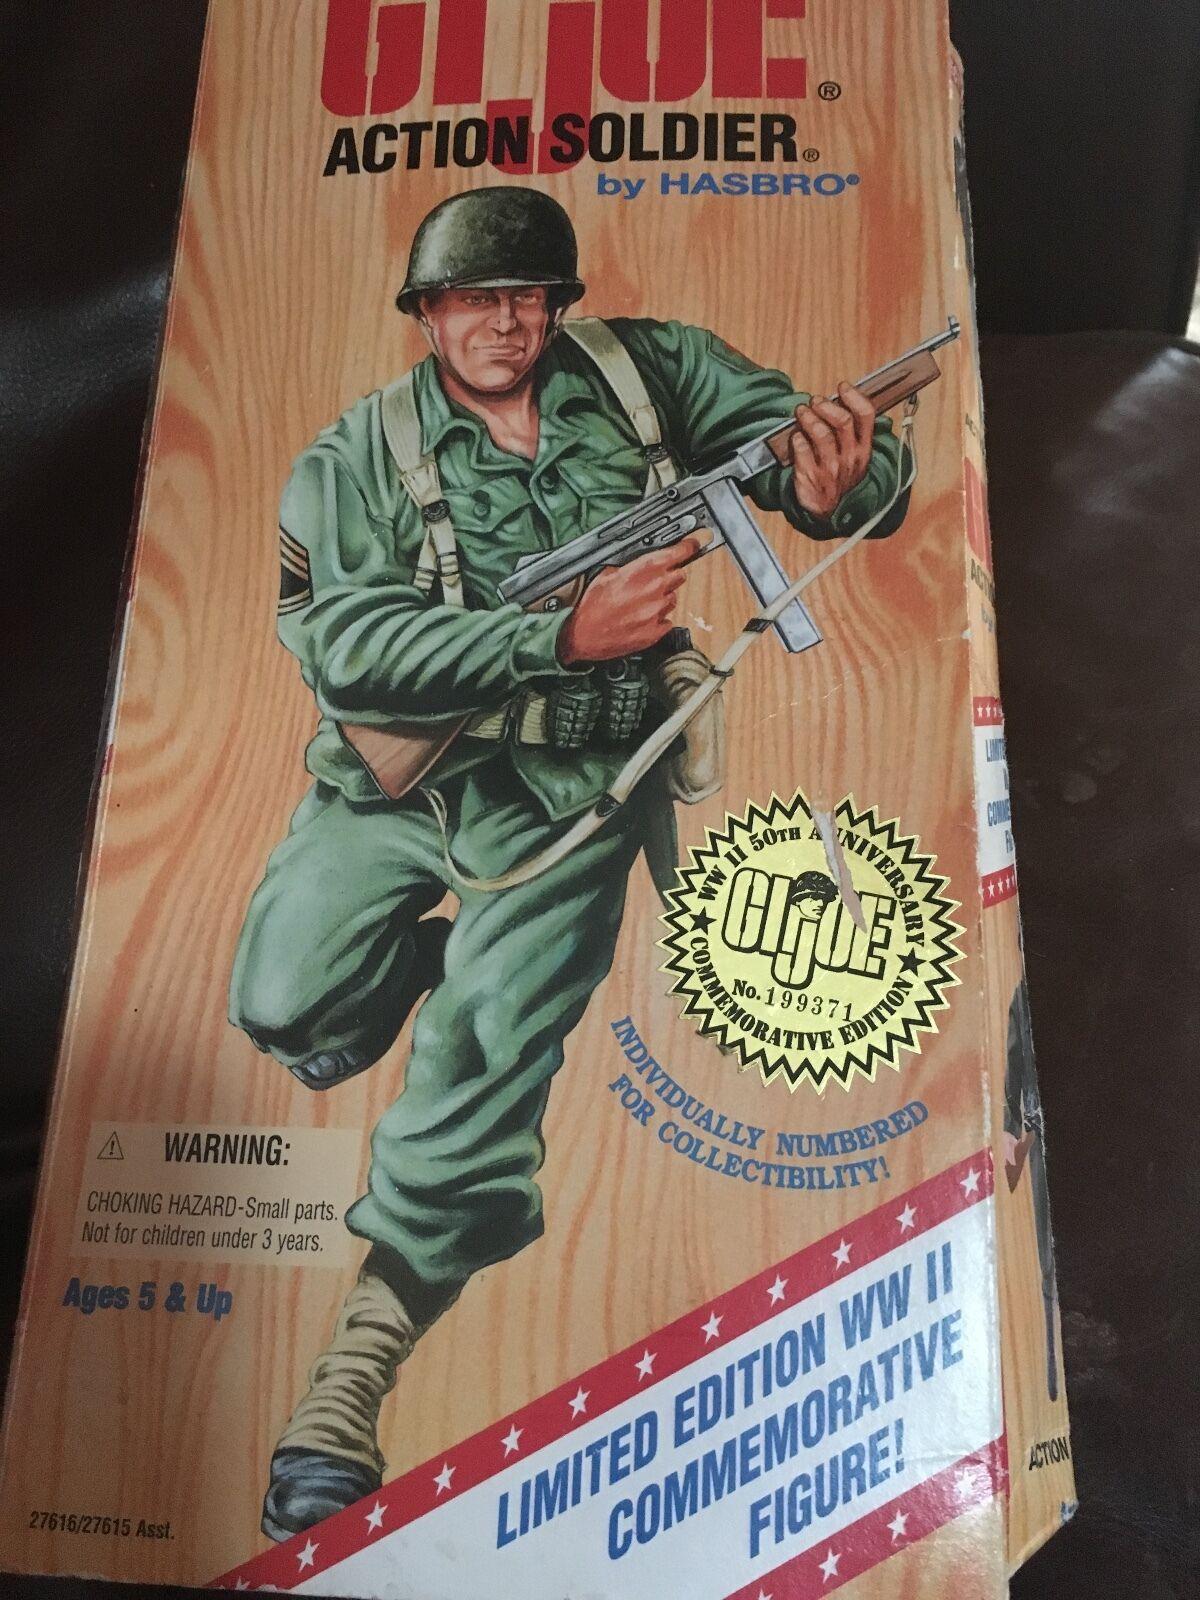 Hasbro gi joe limited edition ww ii gedenk - abbildung 50. jahrestag   19937